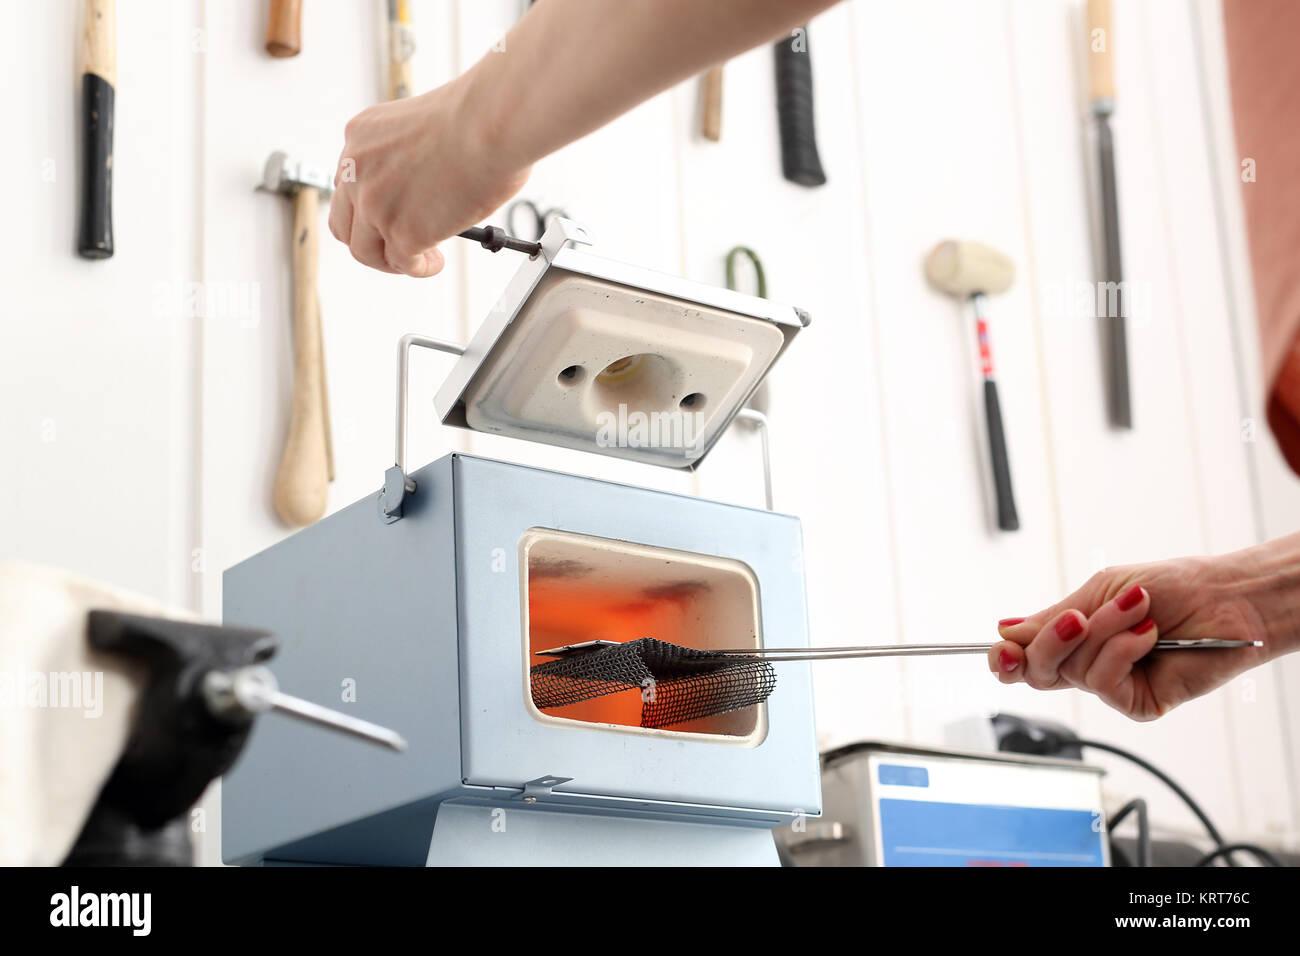 firing furnace stockfotos firing furnace bilder alamy. Black Bedroom Furniture Sets. Home Design Ideas